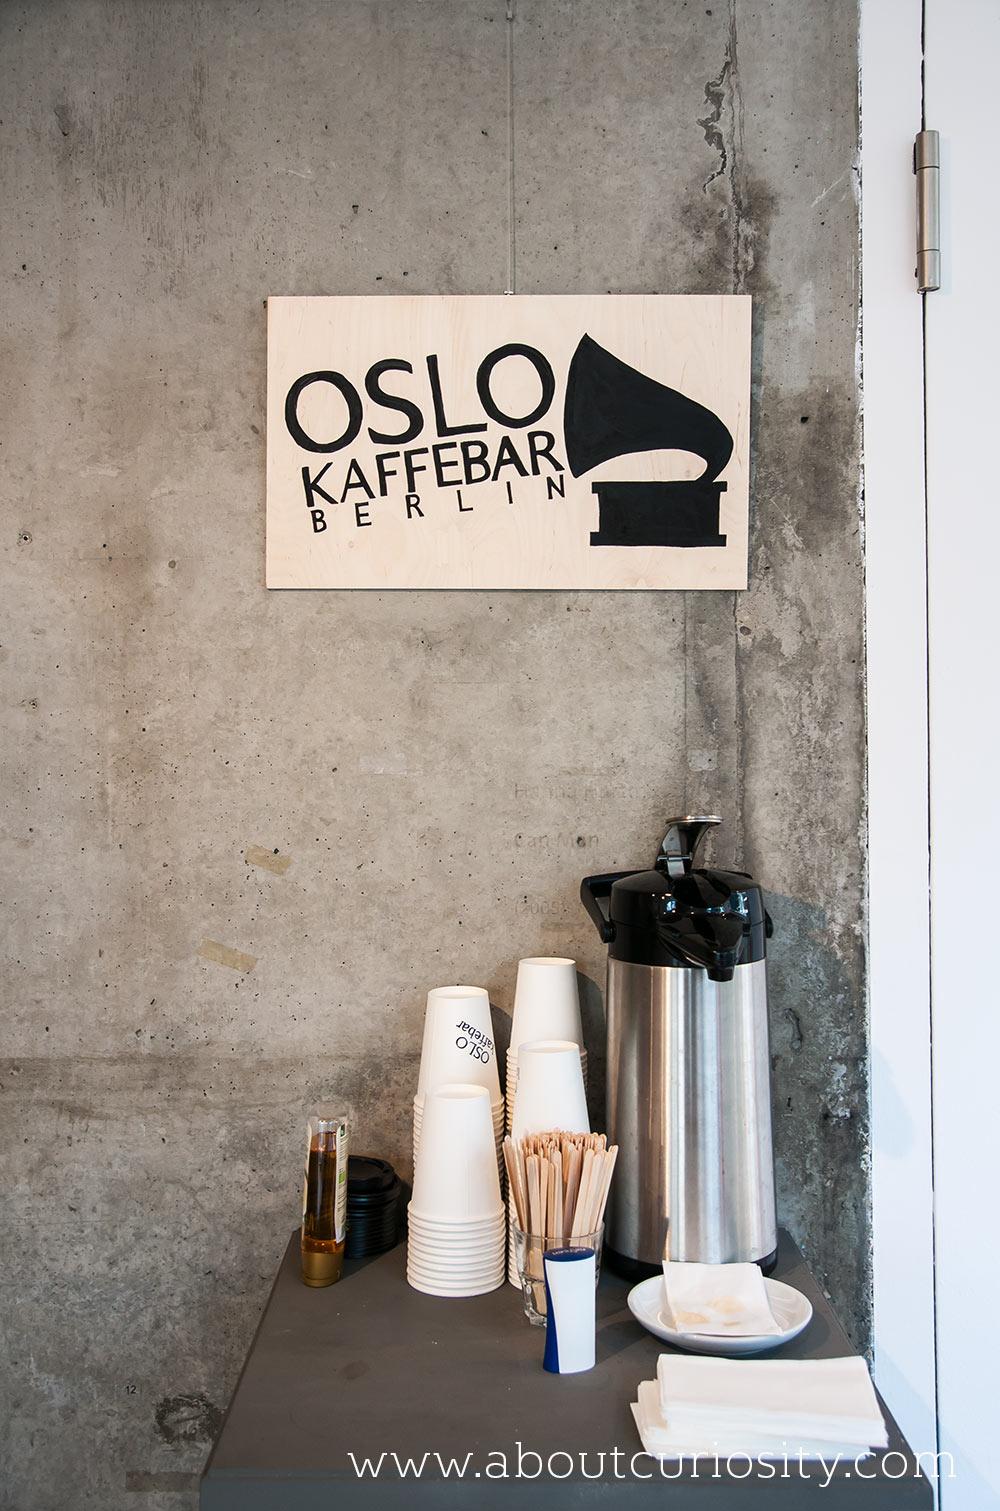 kaffeebar oslo in the nordic embassy from berlin